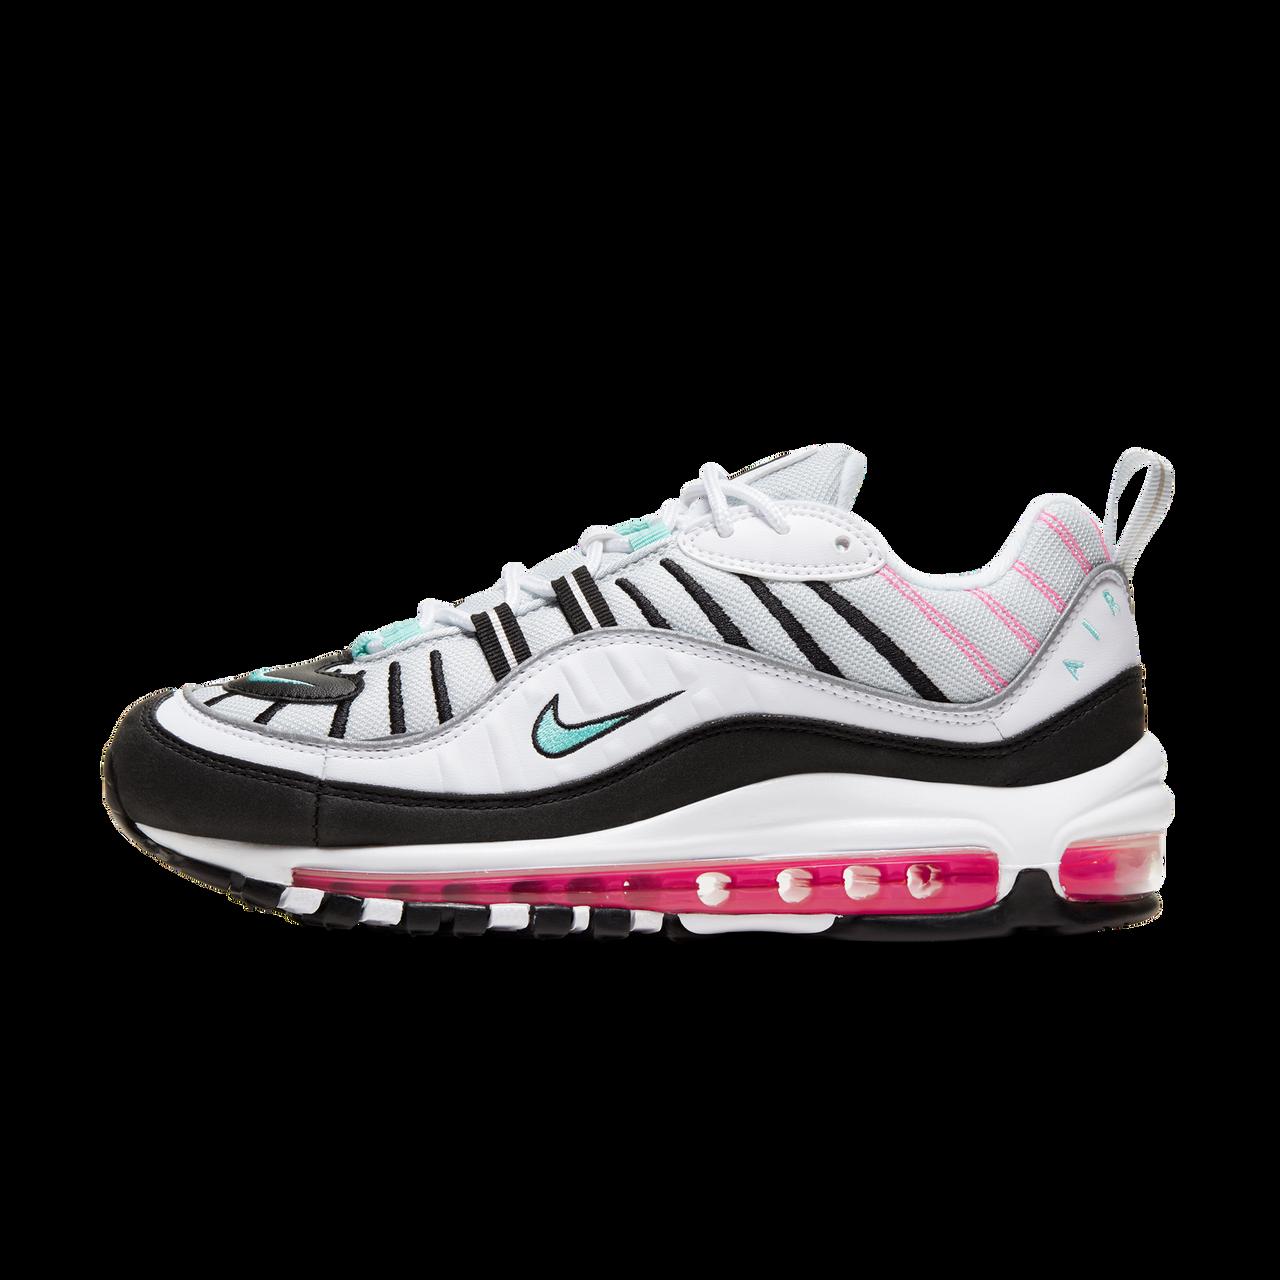 Nike Air Max 98 wmns - White/Pink